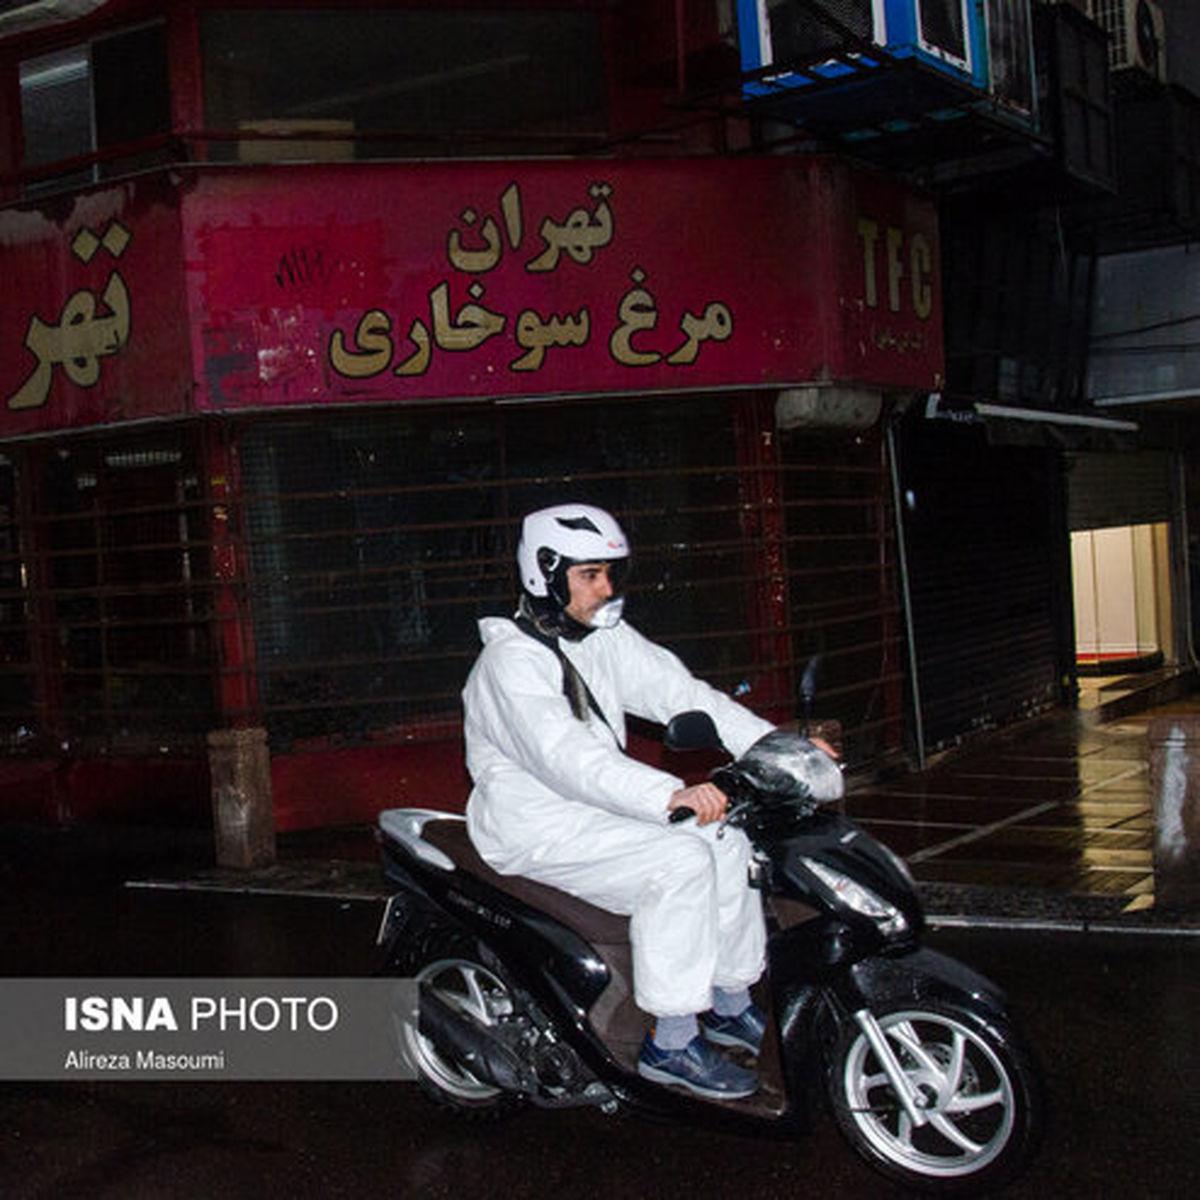 پوشش ضد کرونایی عجیب مرد تهرانی +عکس